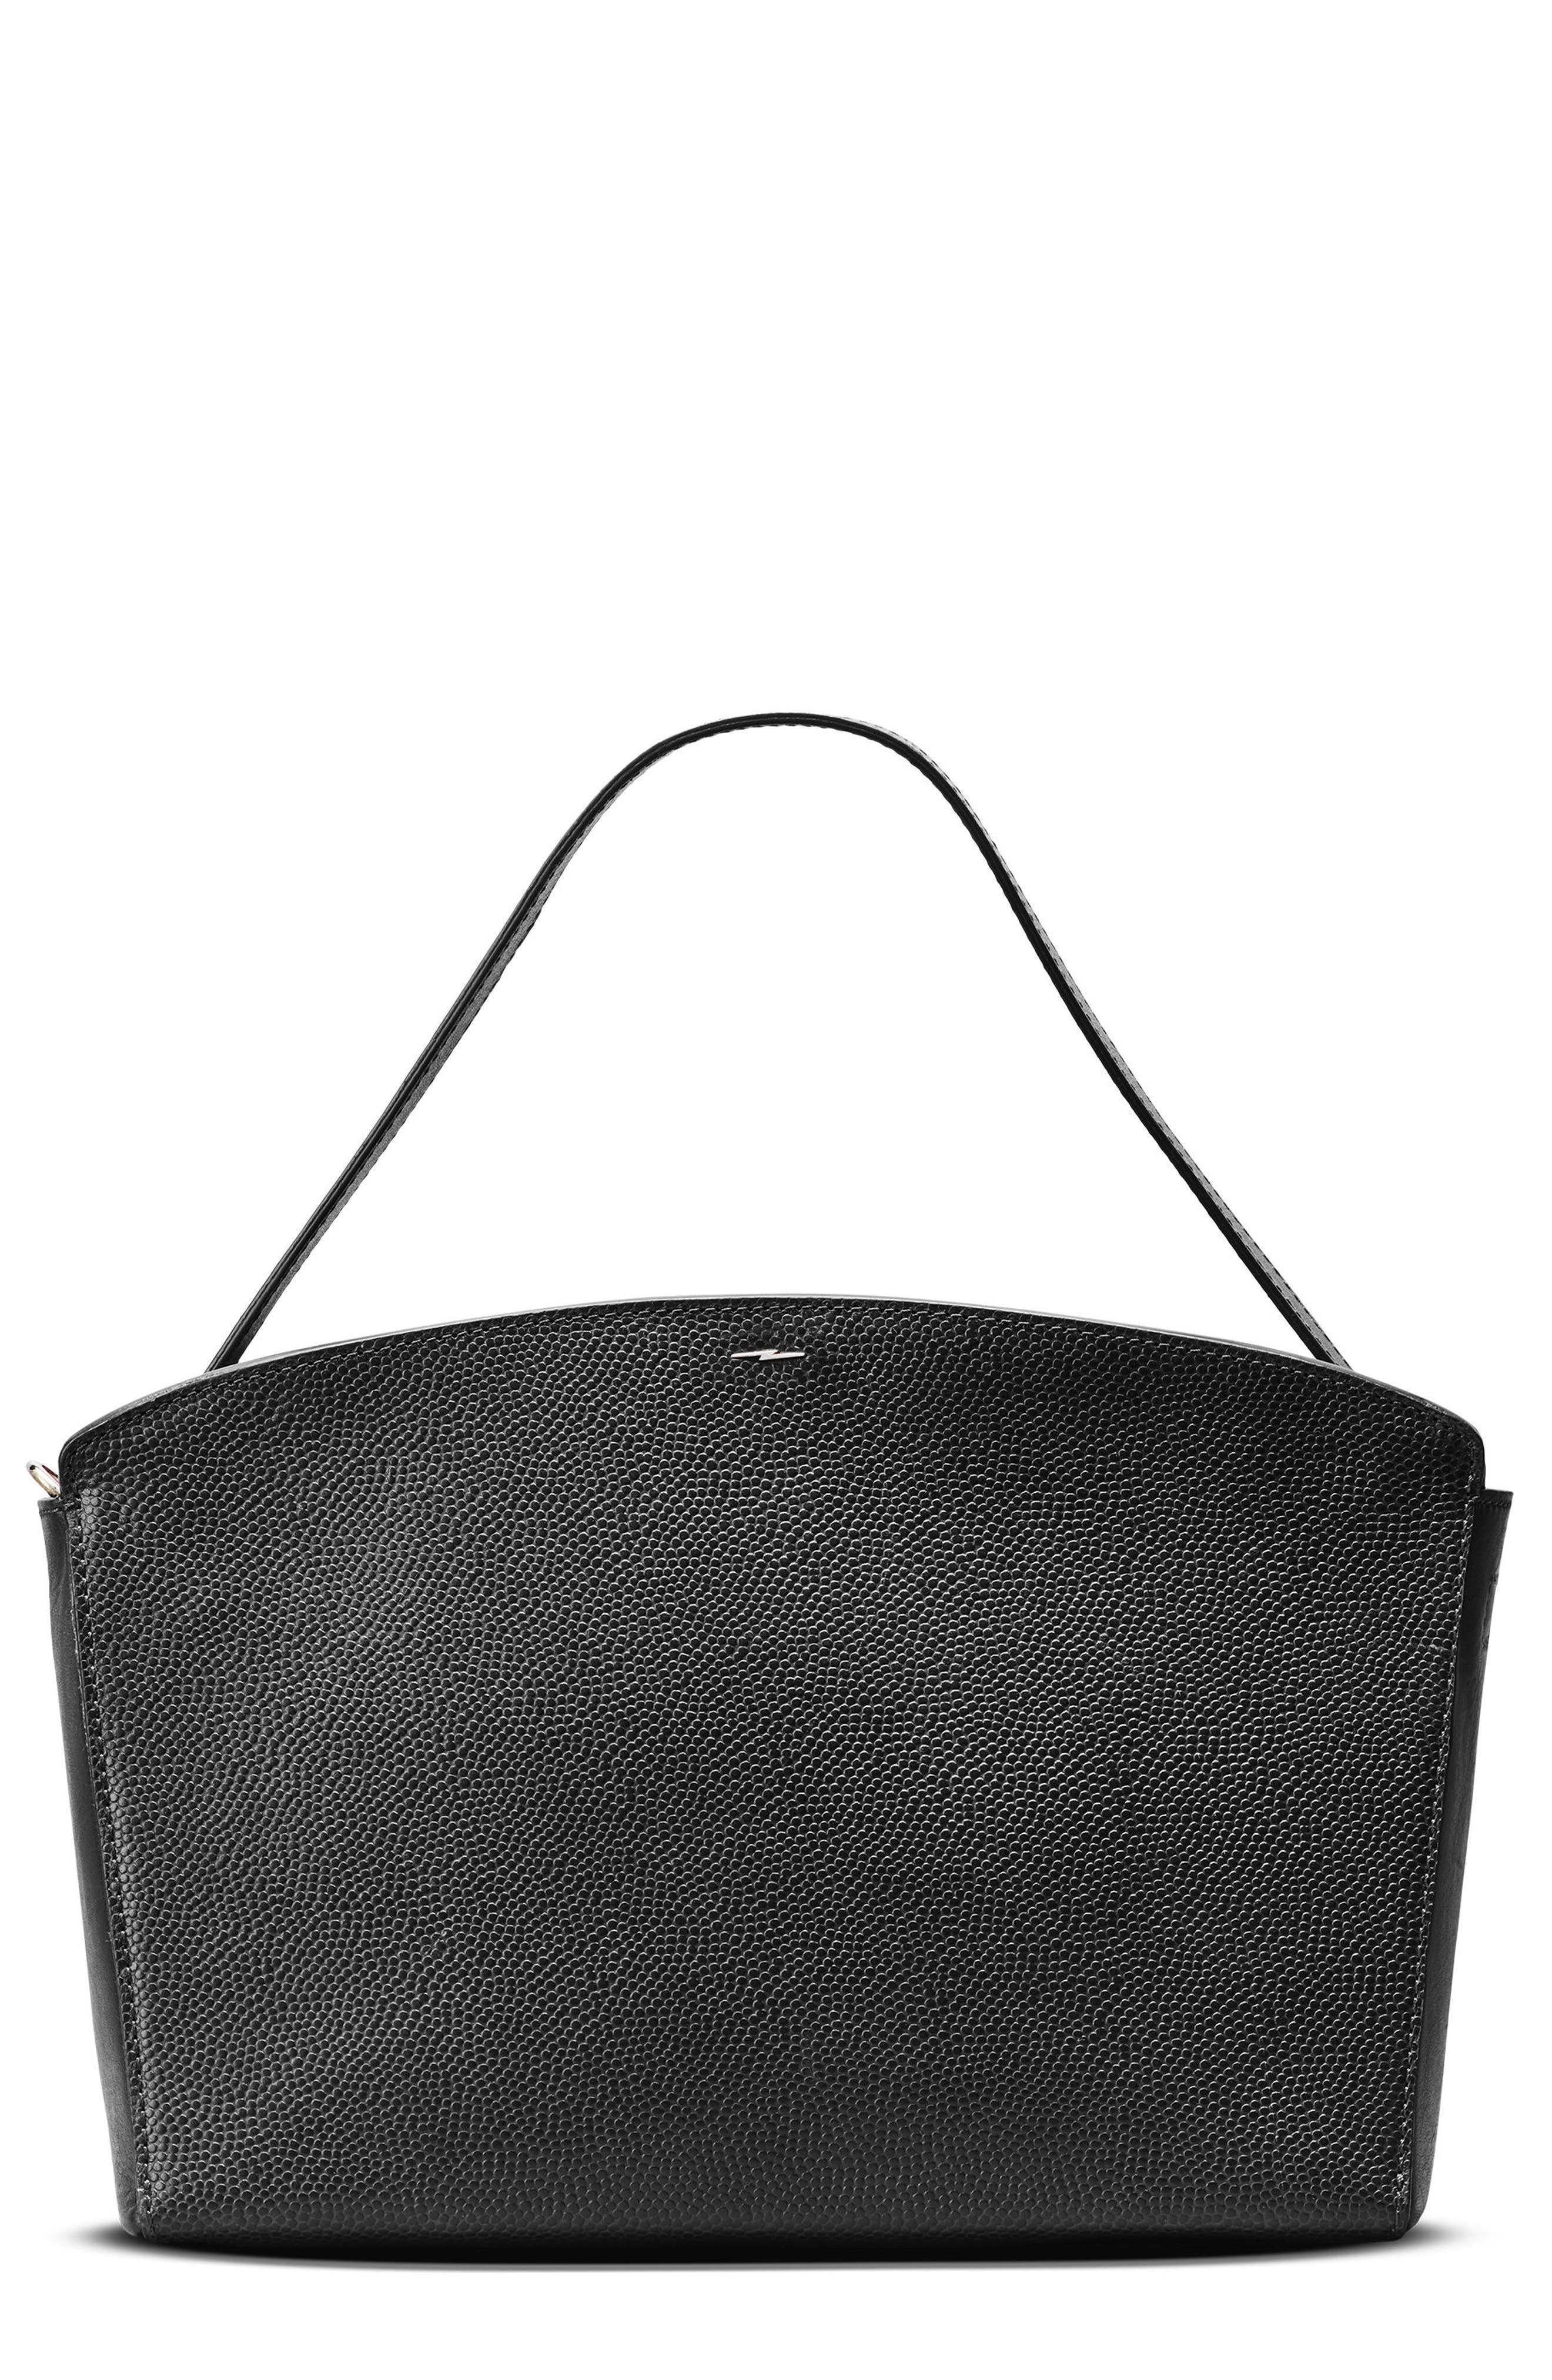 Shinola Curved Latigo Leather Satchel